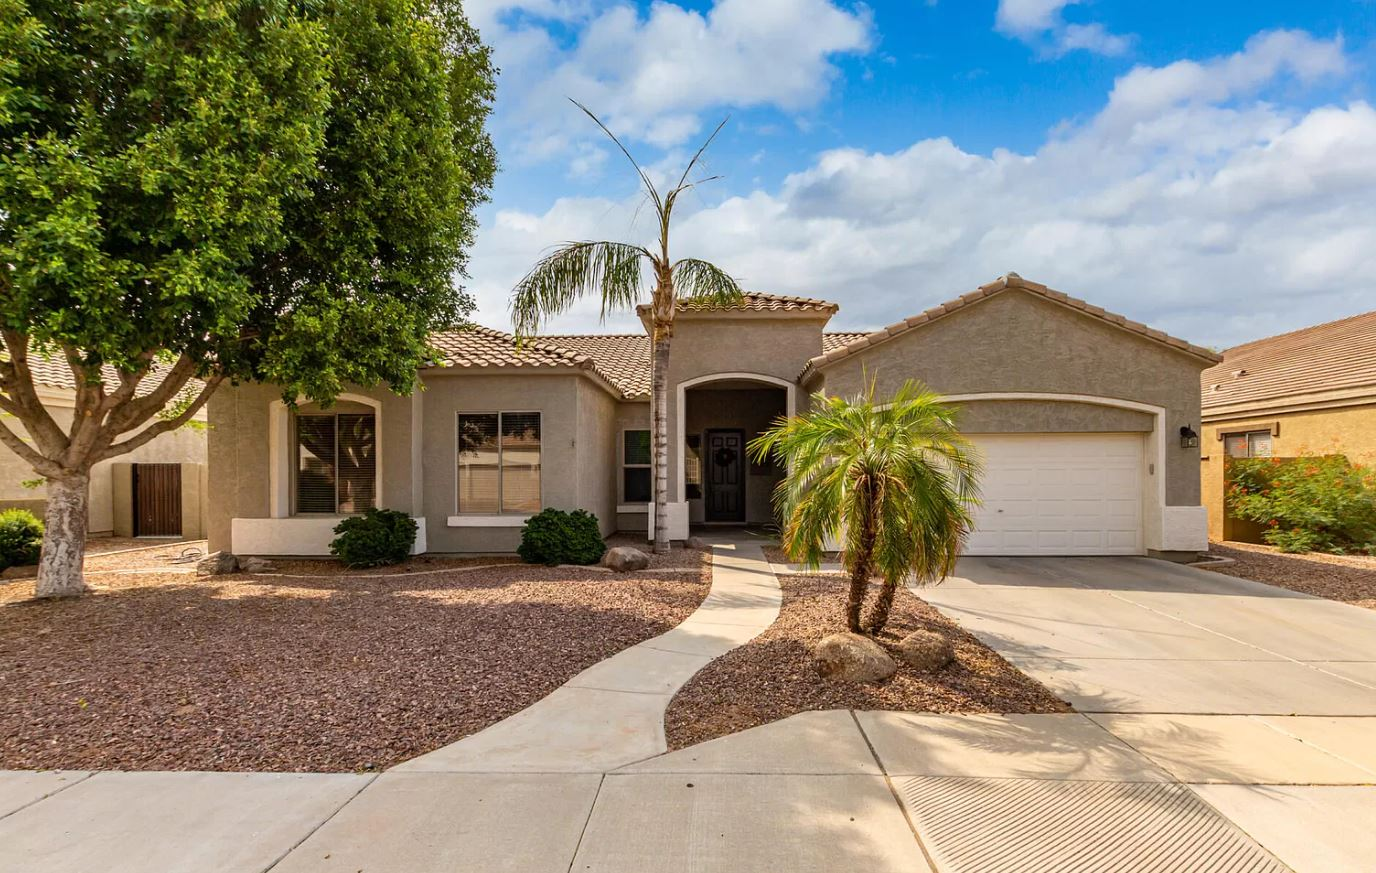 10329 E Irwin Ave, Mesa, AZ 85209